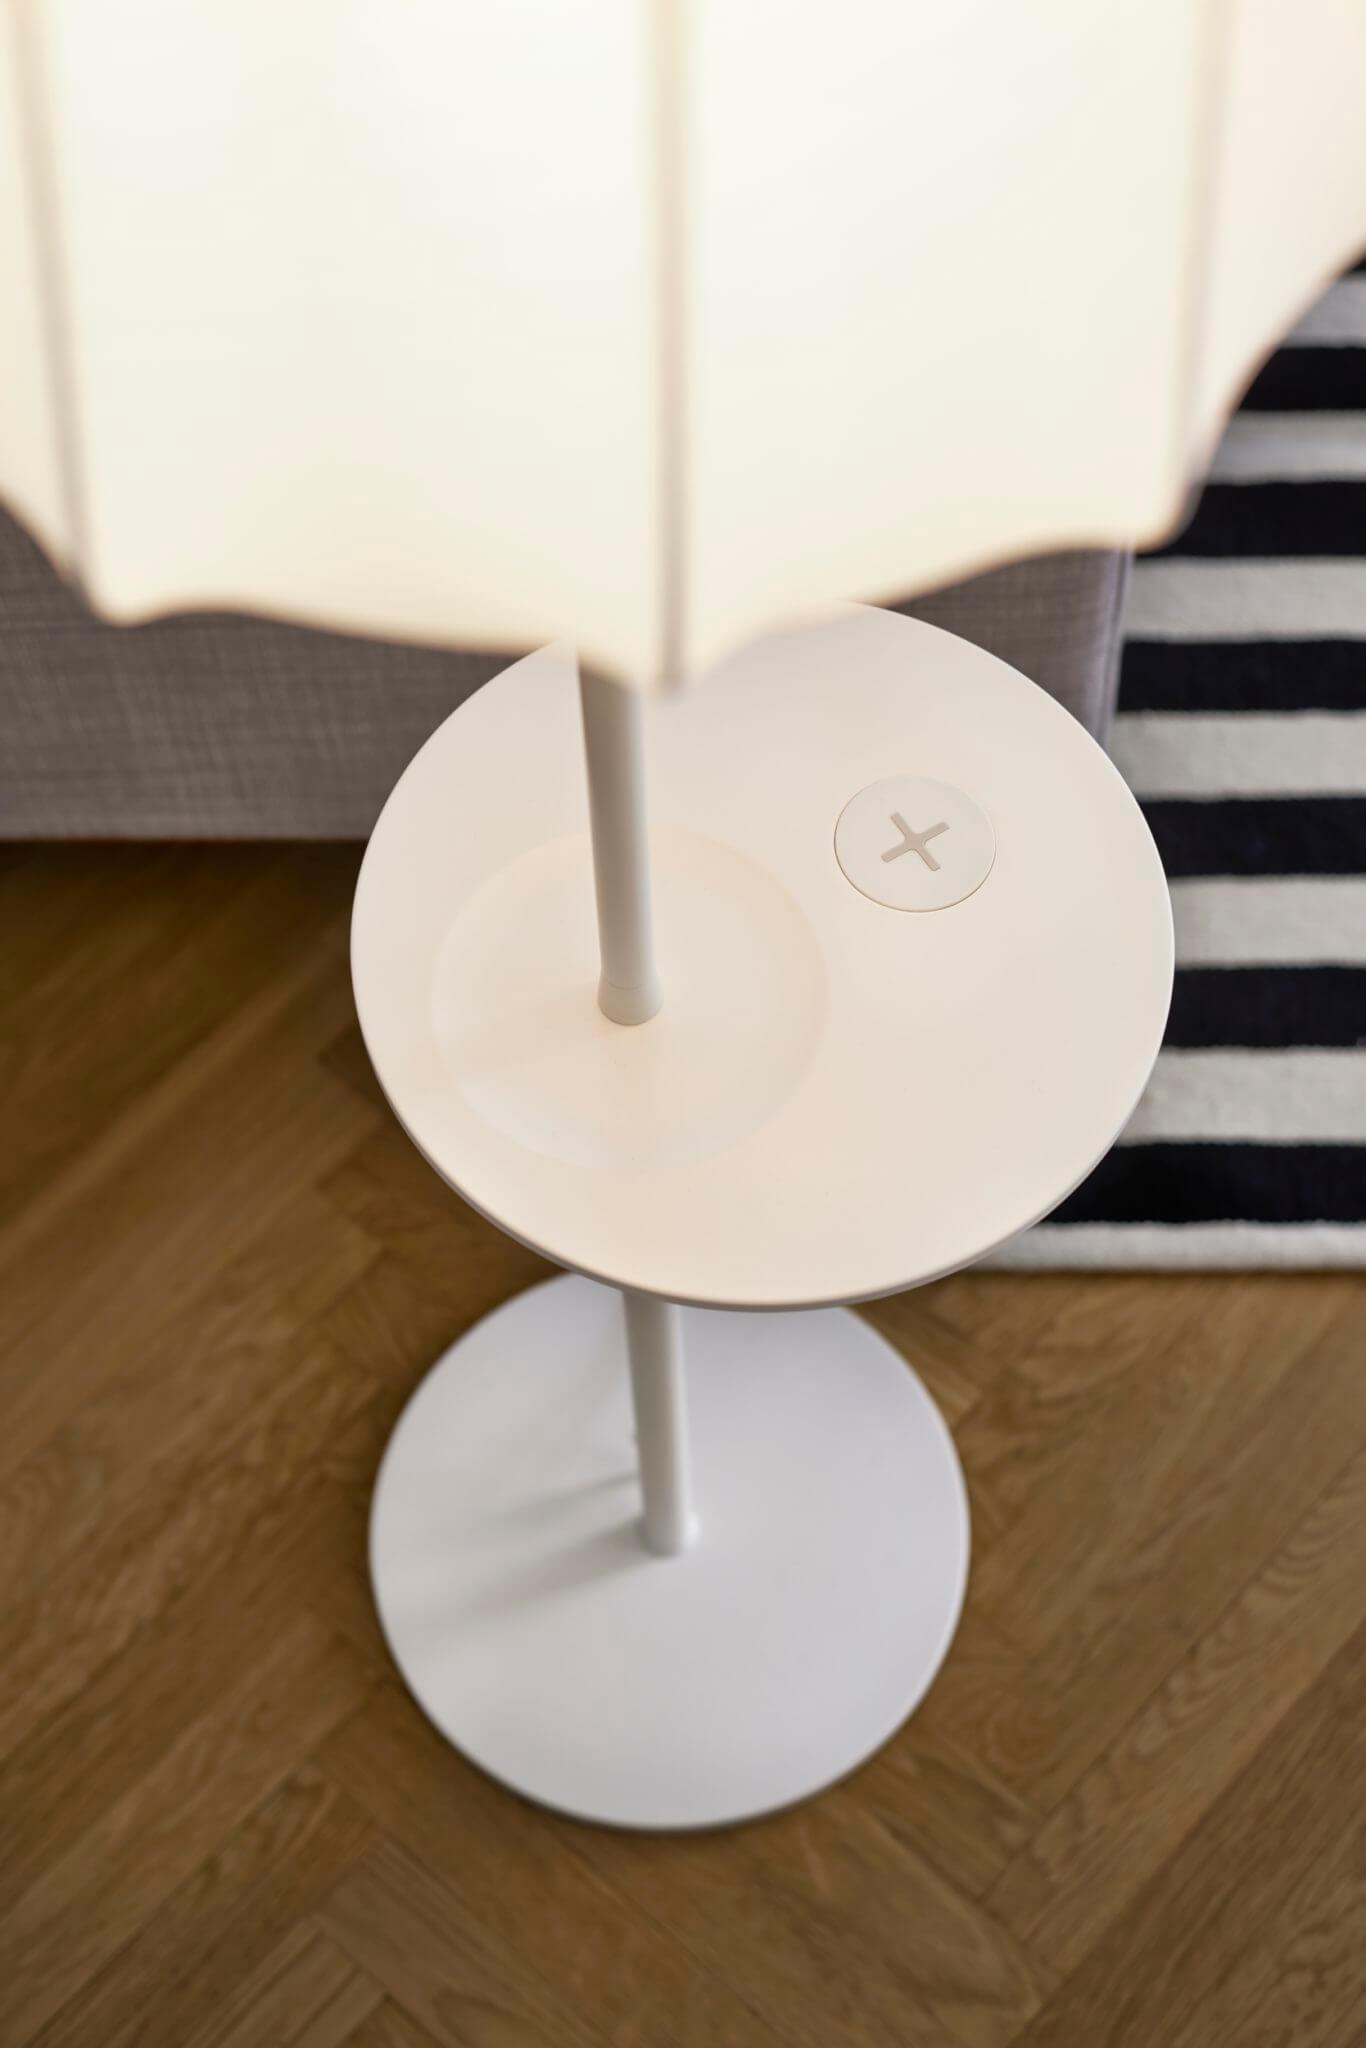 ikea lampen und tische mit qi ladeger t ab april. Black Bedroom Furniture Sets. Home Design Ideas